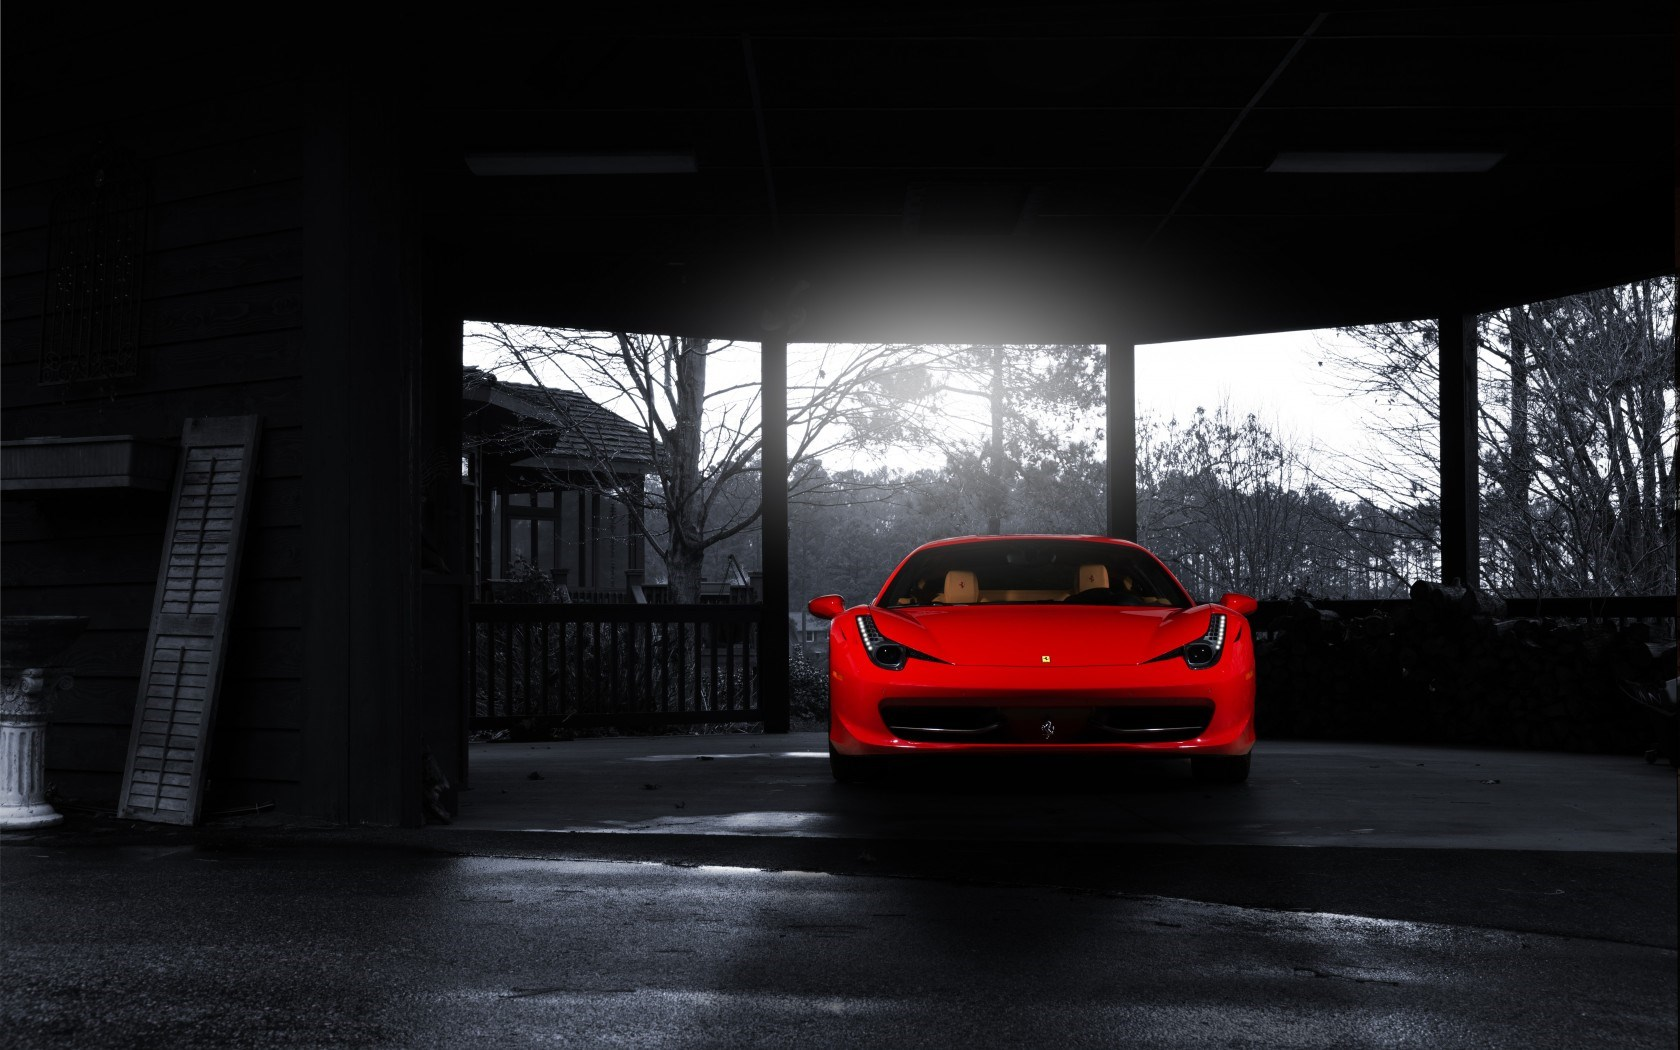 Ferrari 458 Red Car Front